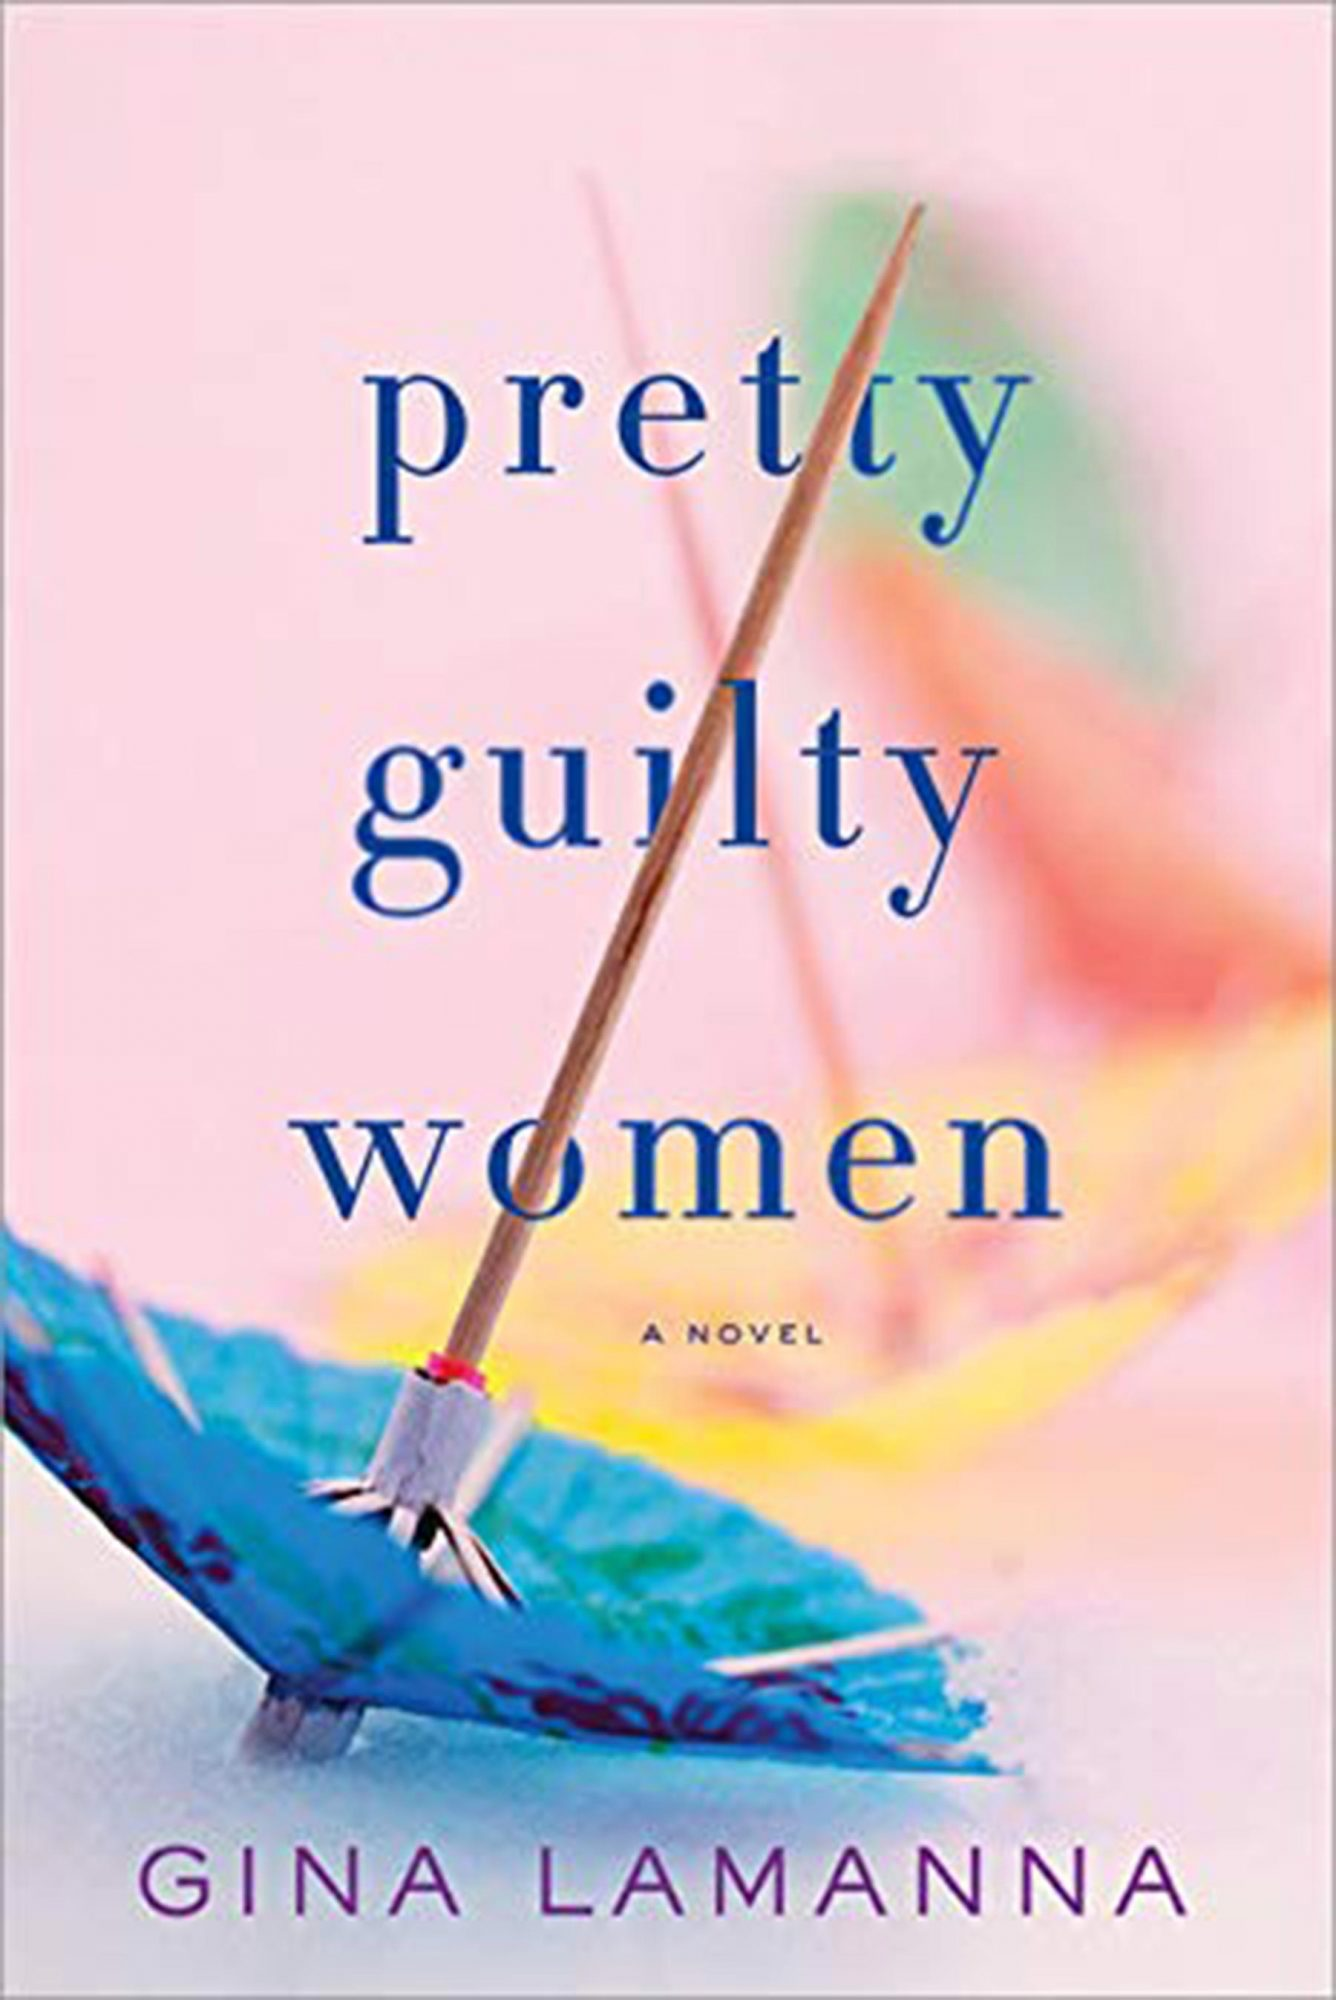 Pretty-Guilty-Women-by-Gina-Lamanna